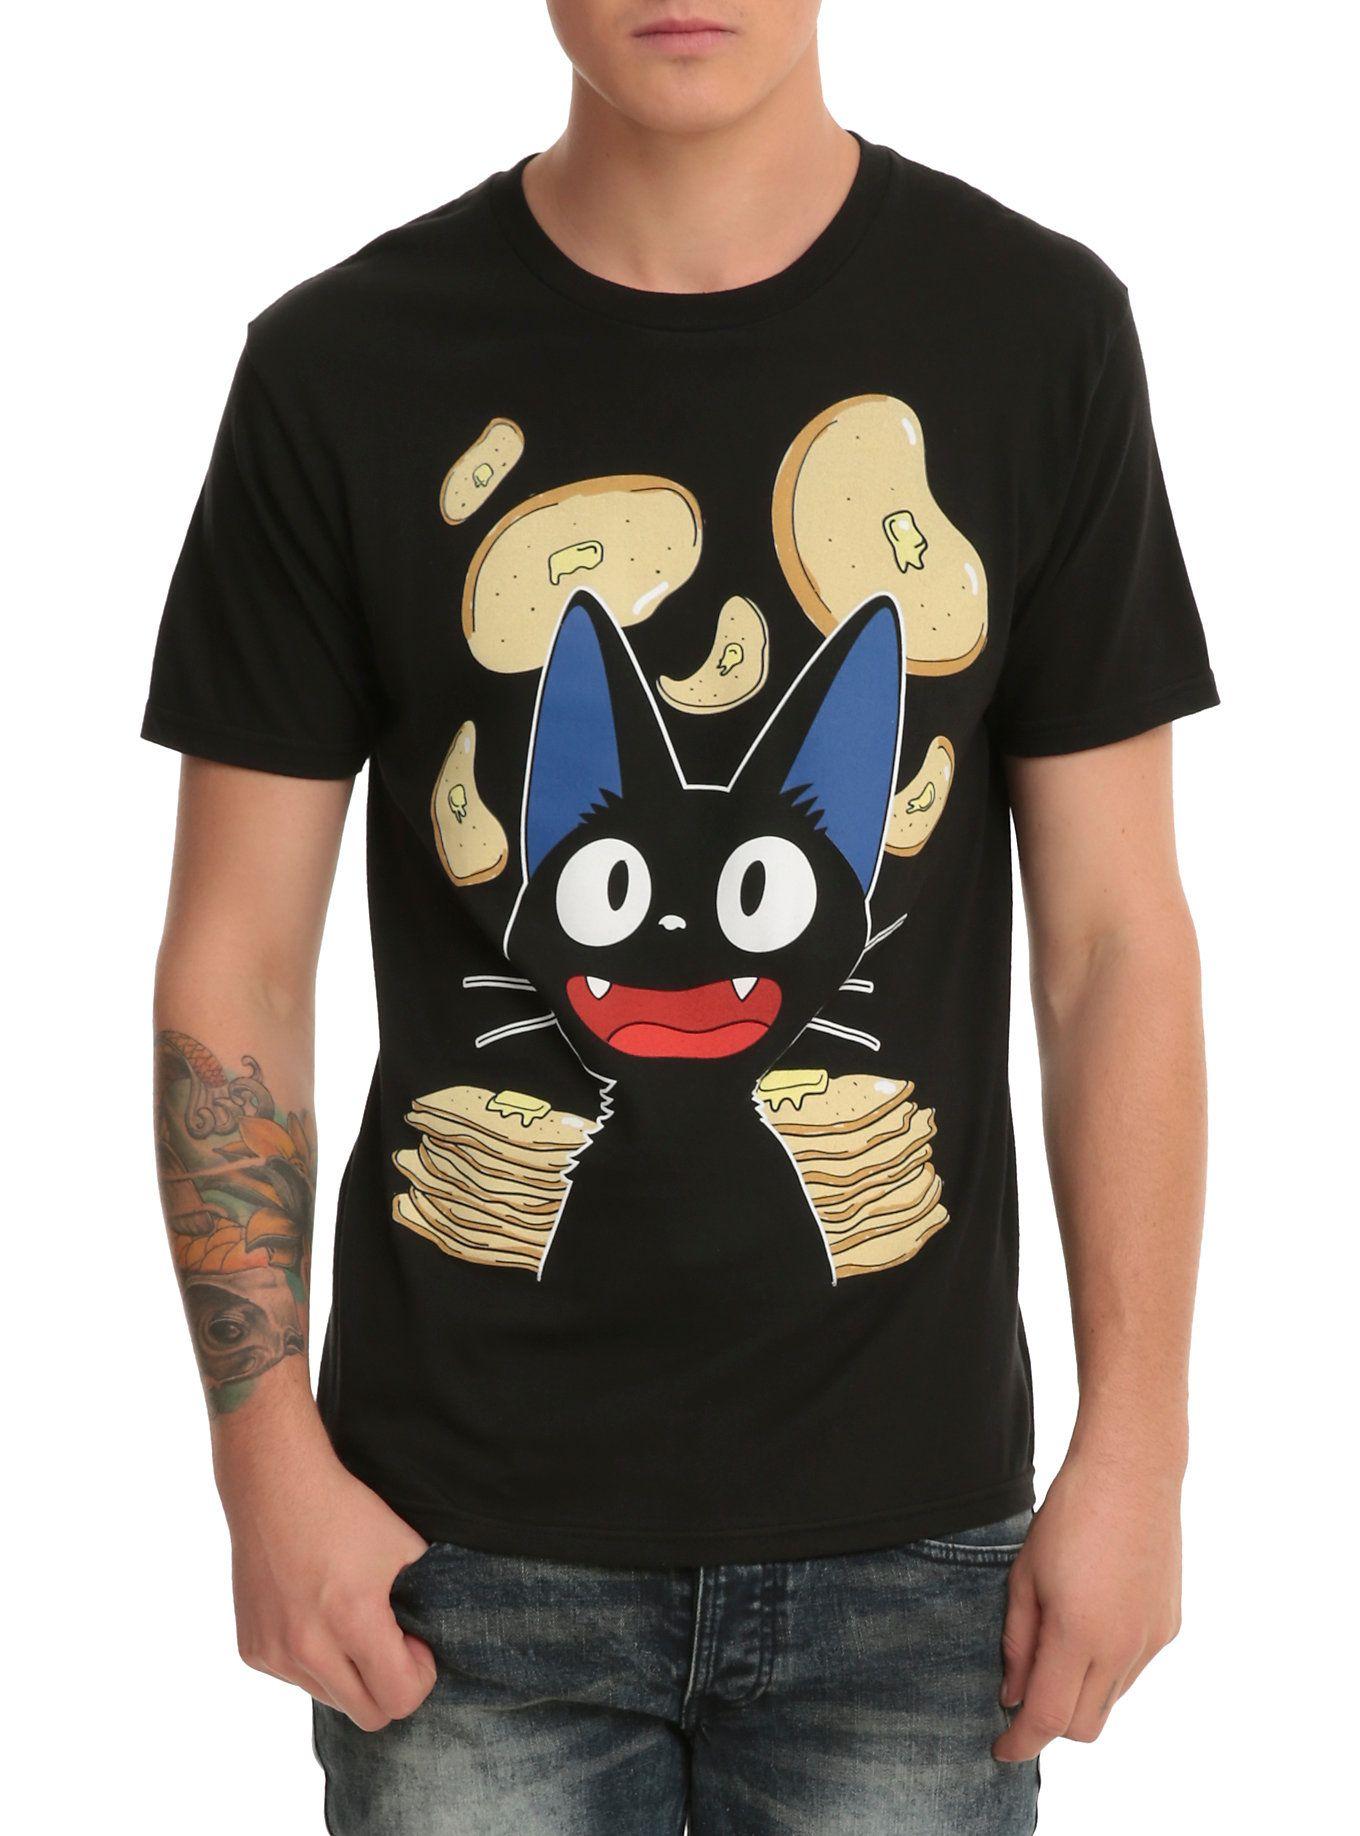 cd7faa82a68 Studio Ghibli Kiki s Delivery Service Jiji Pancakes T-Shirt